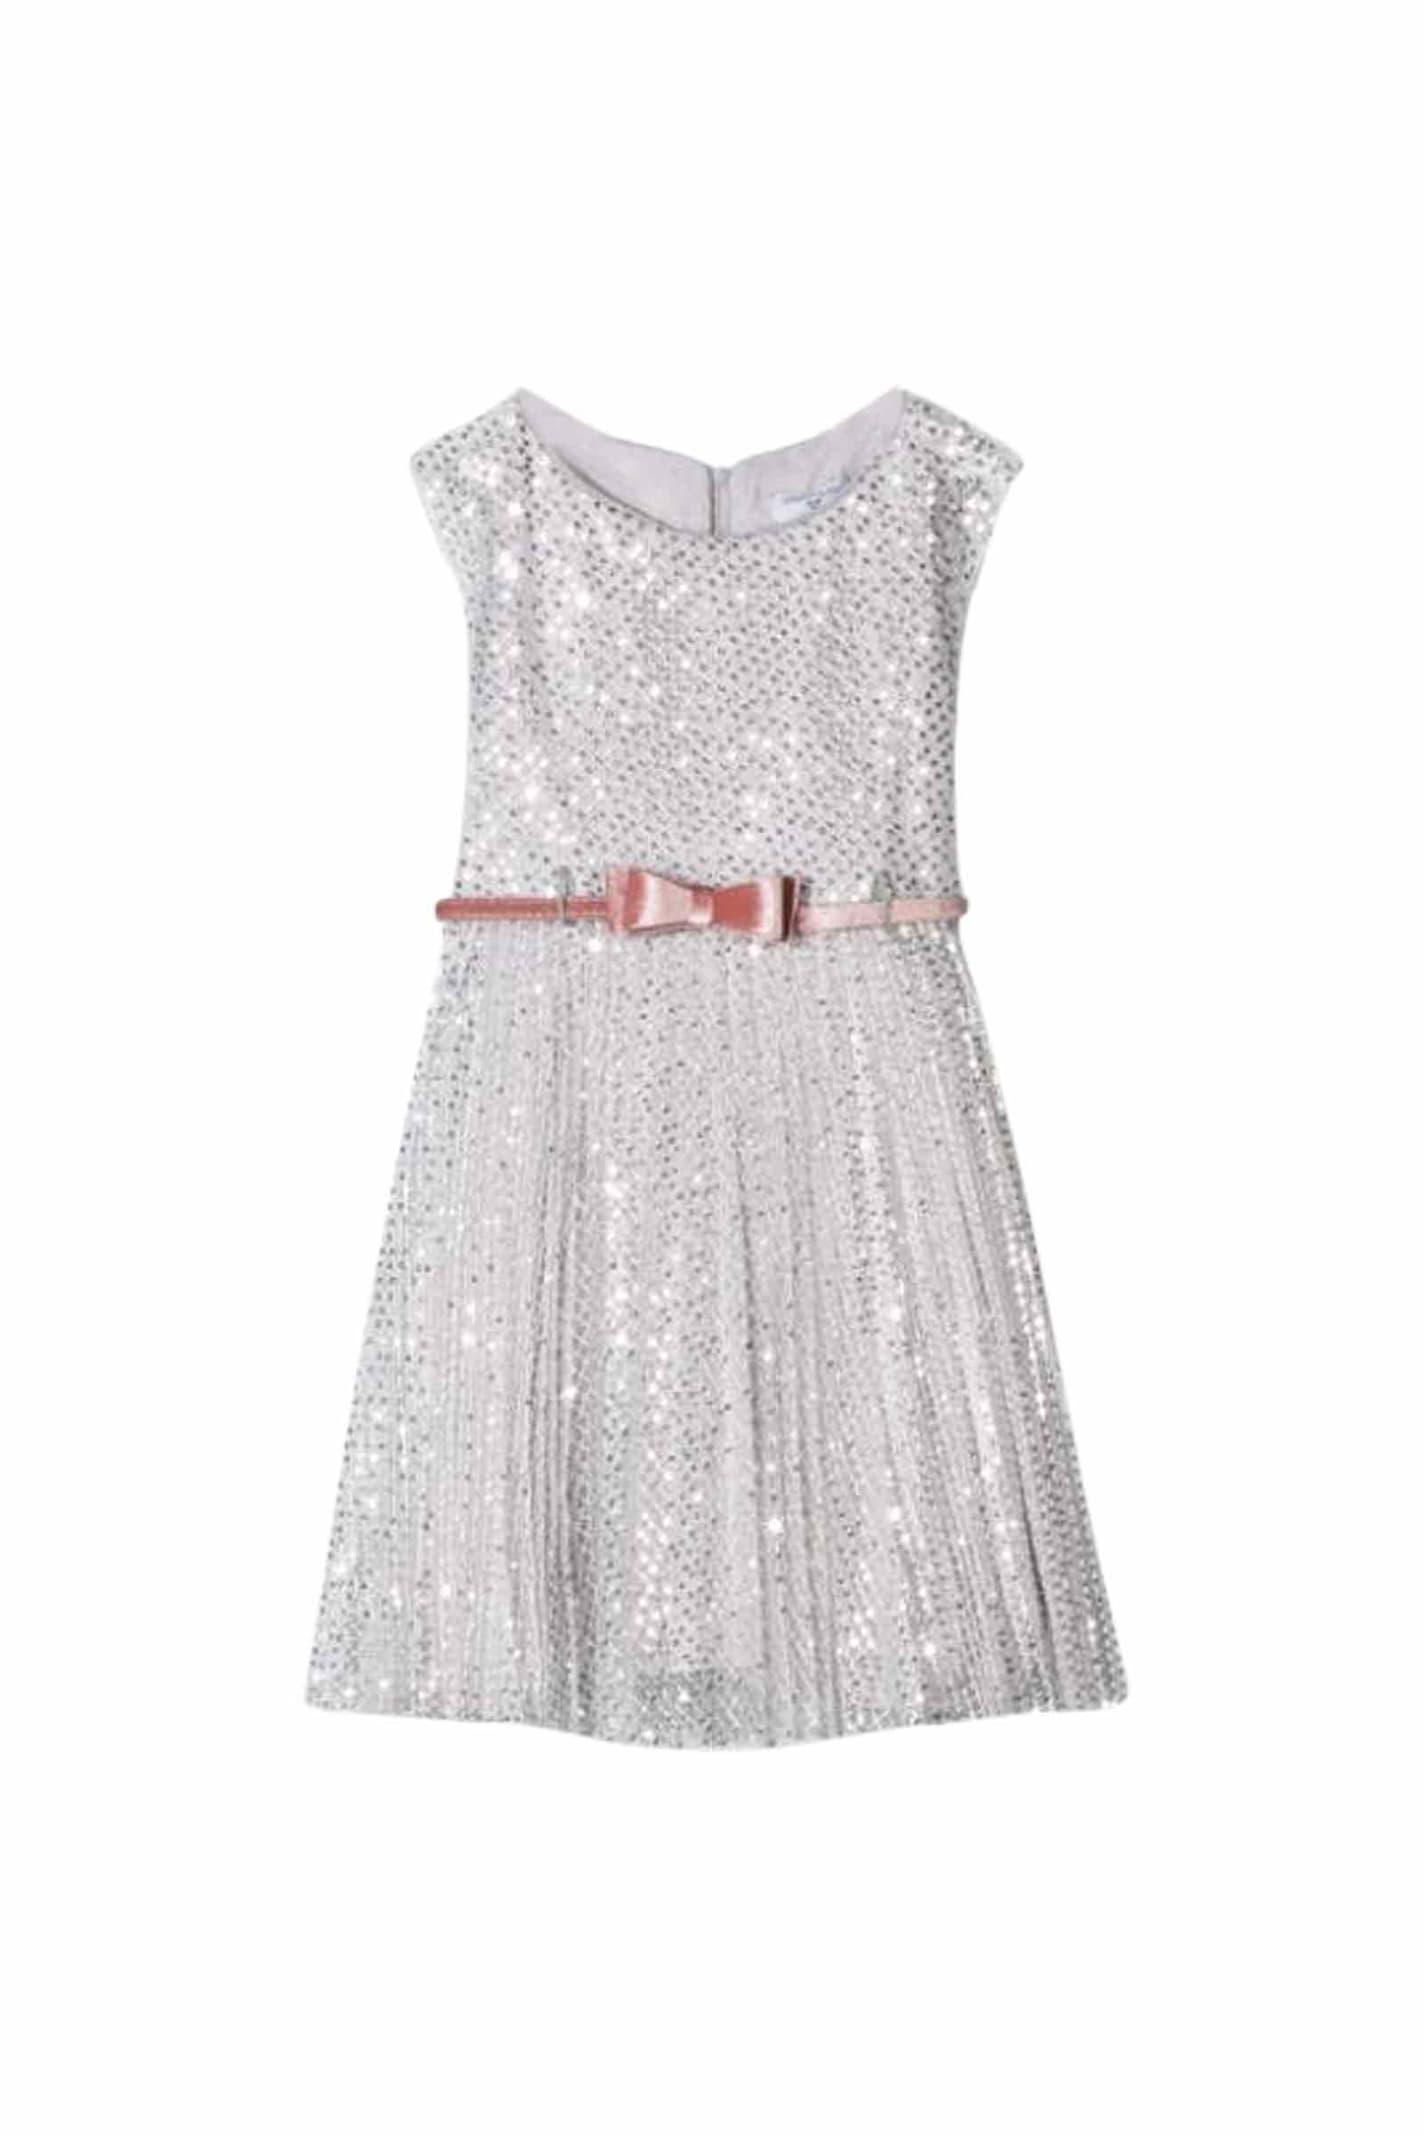 Monnalisa Sequins Dress